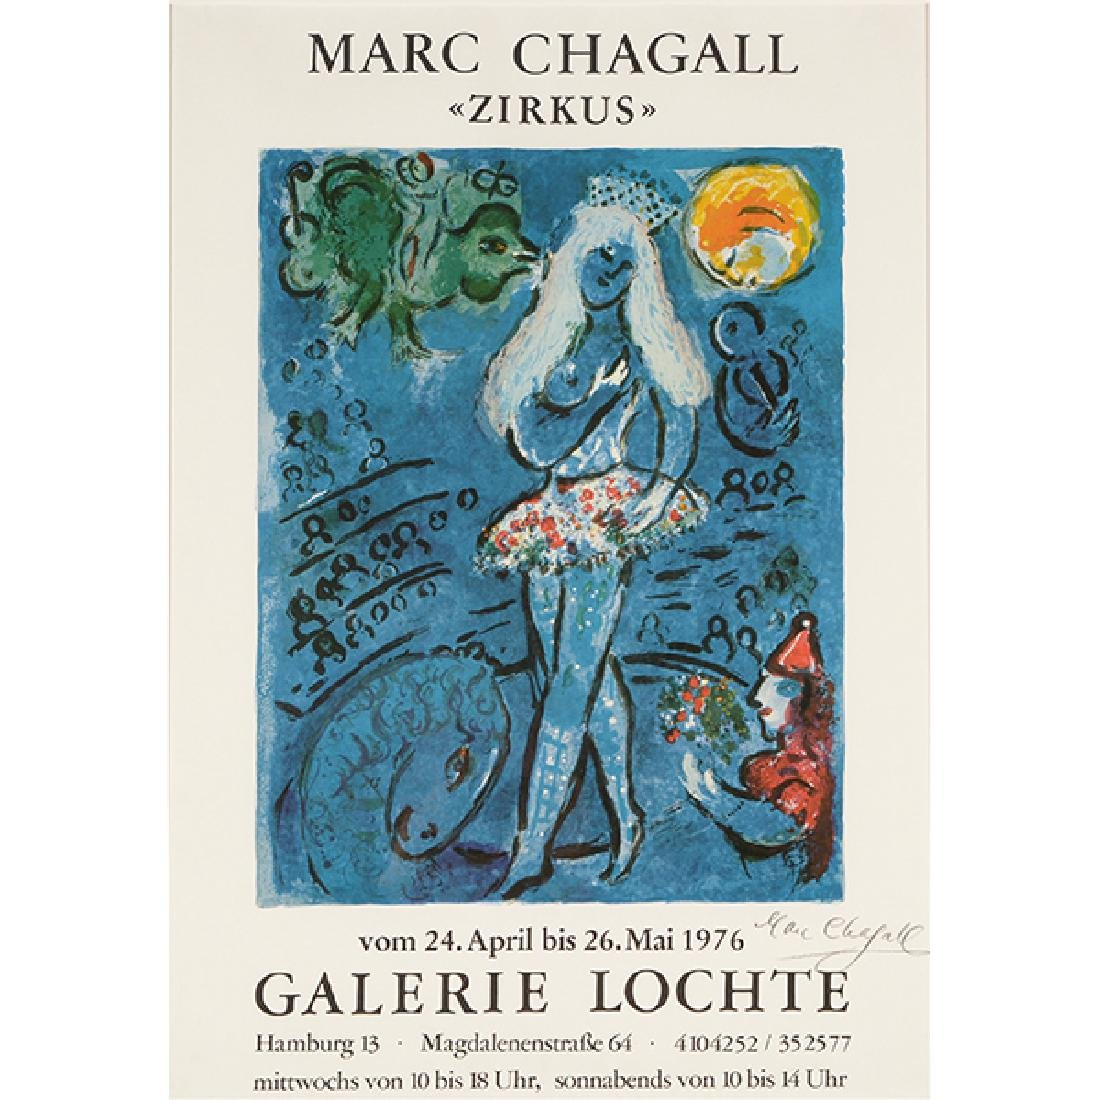 "Marc Chagall ""Zirkus"" (Galerie Lochte, Hamburg Germany)"